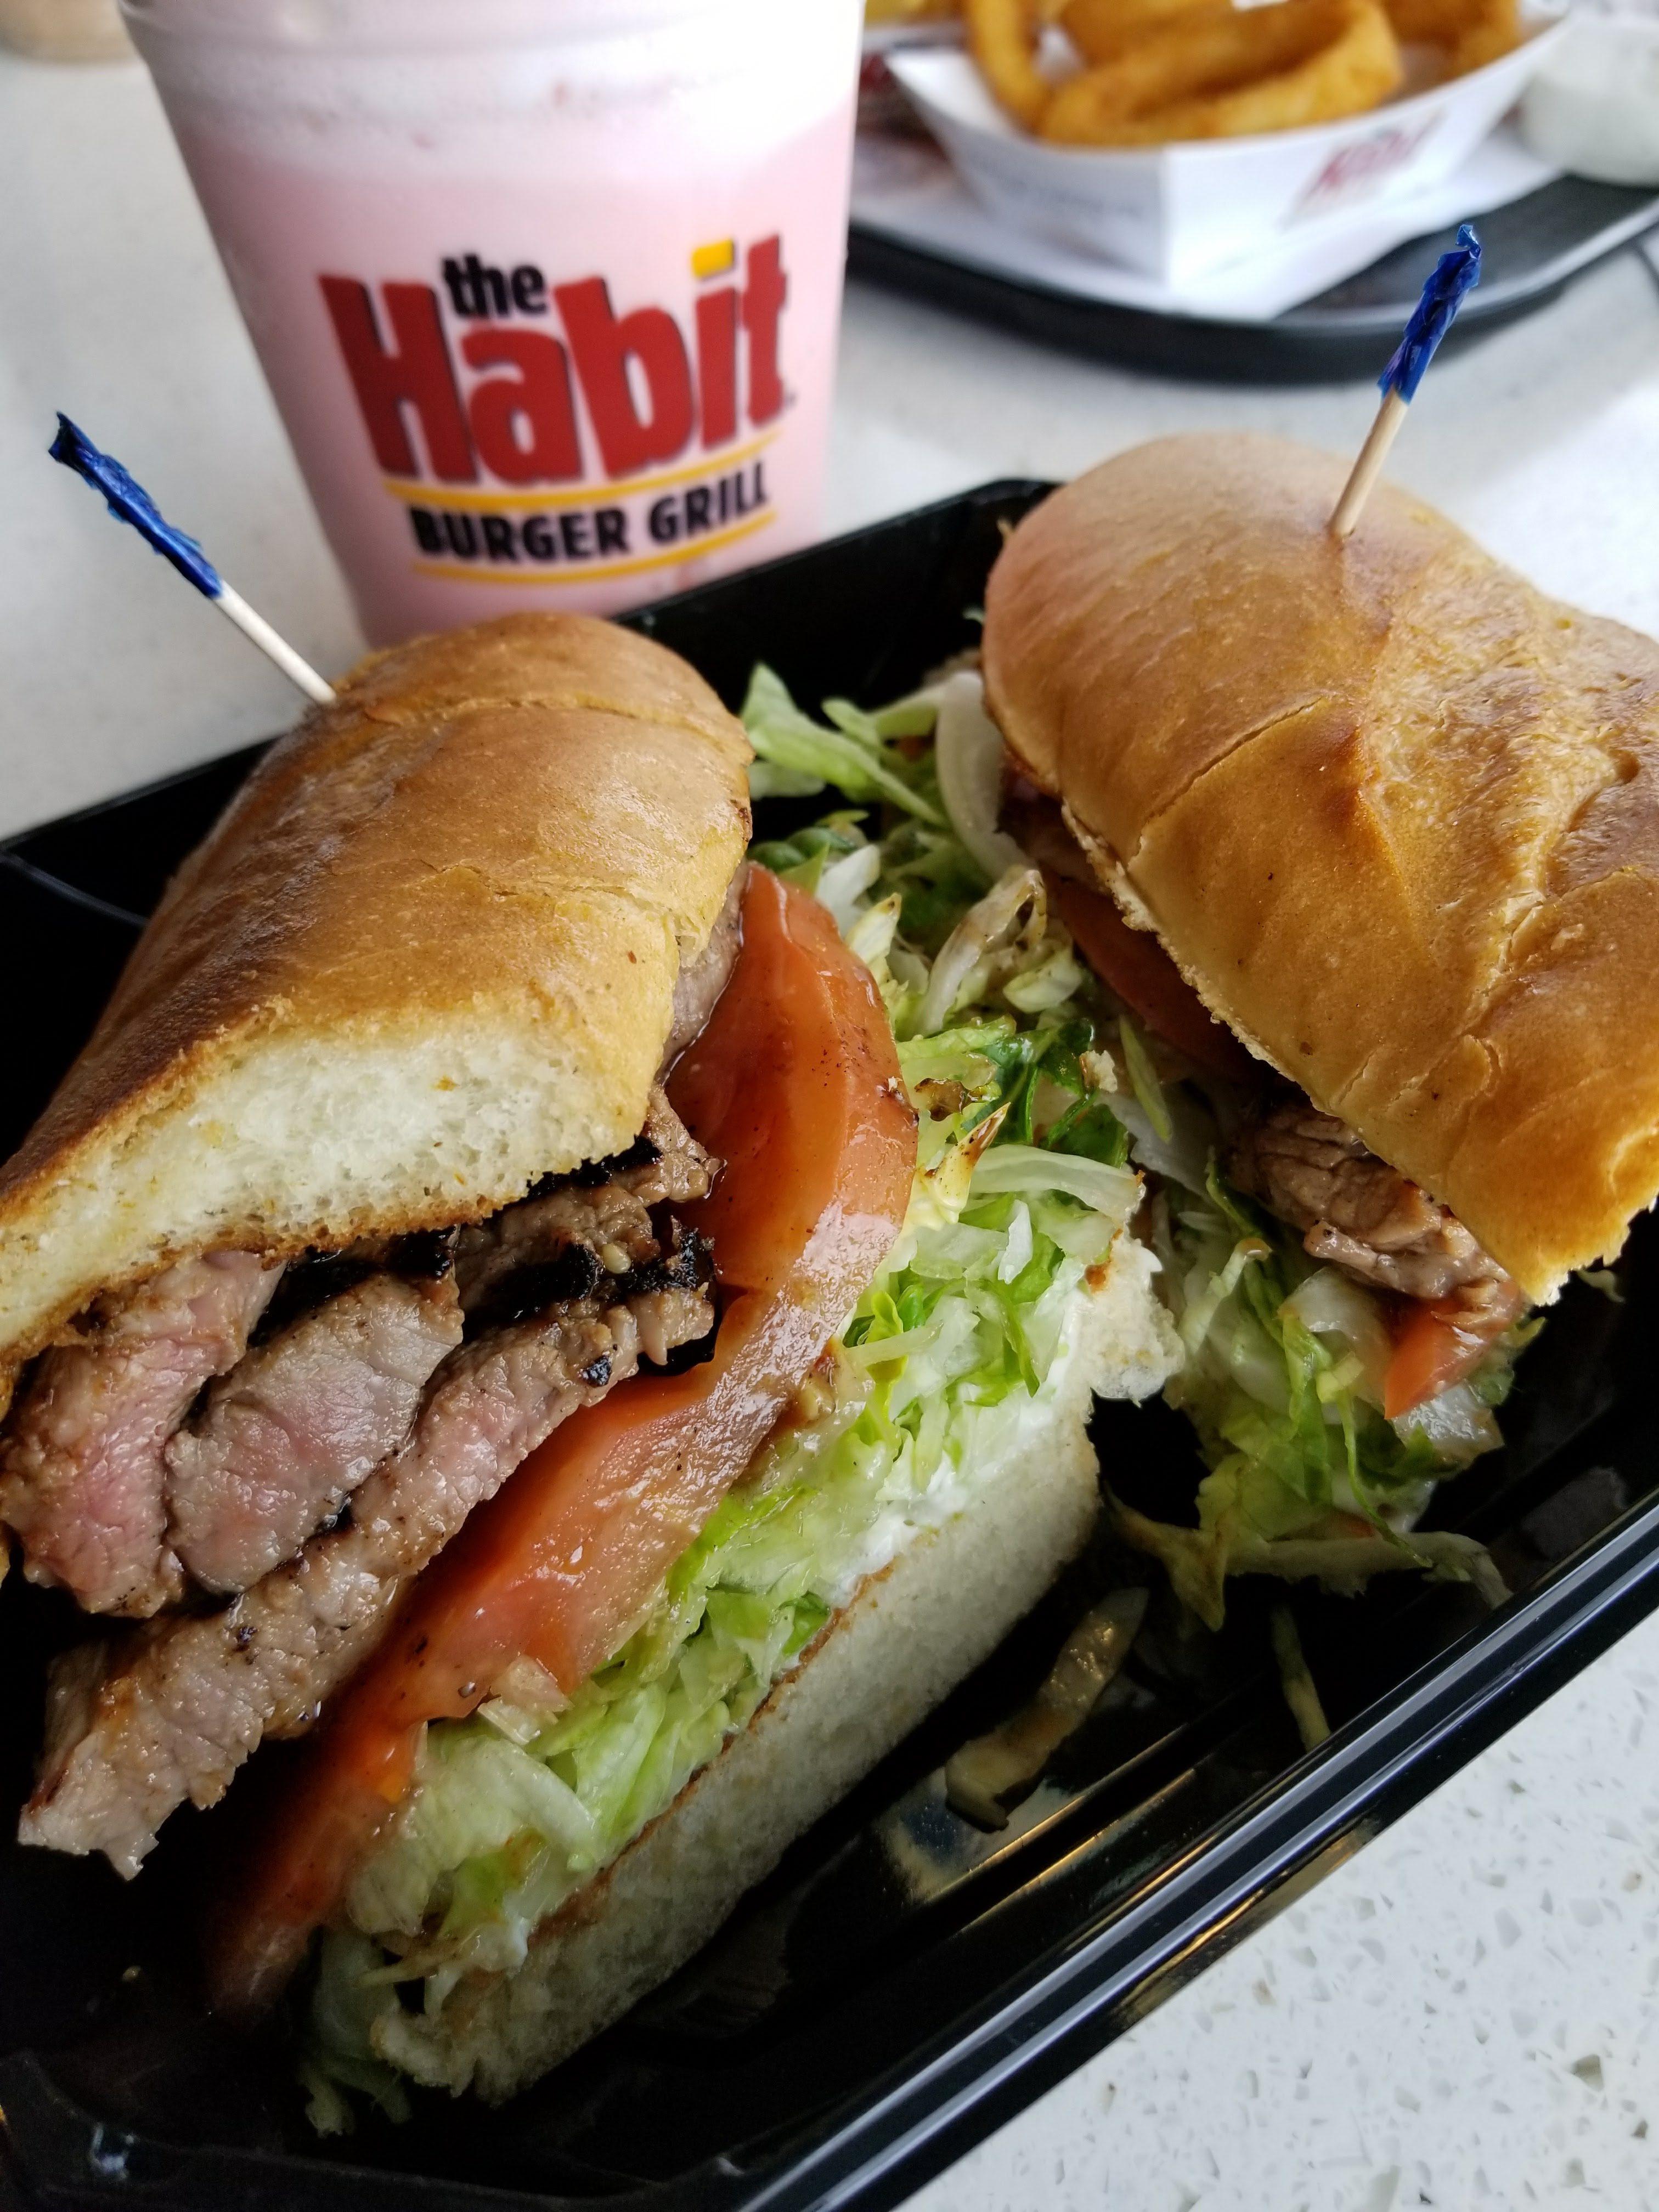 The Habit Burger Grill Tacoma WA